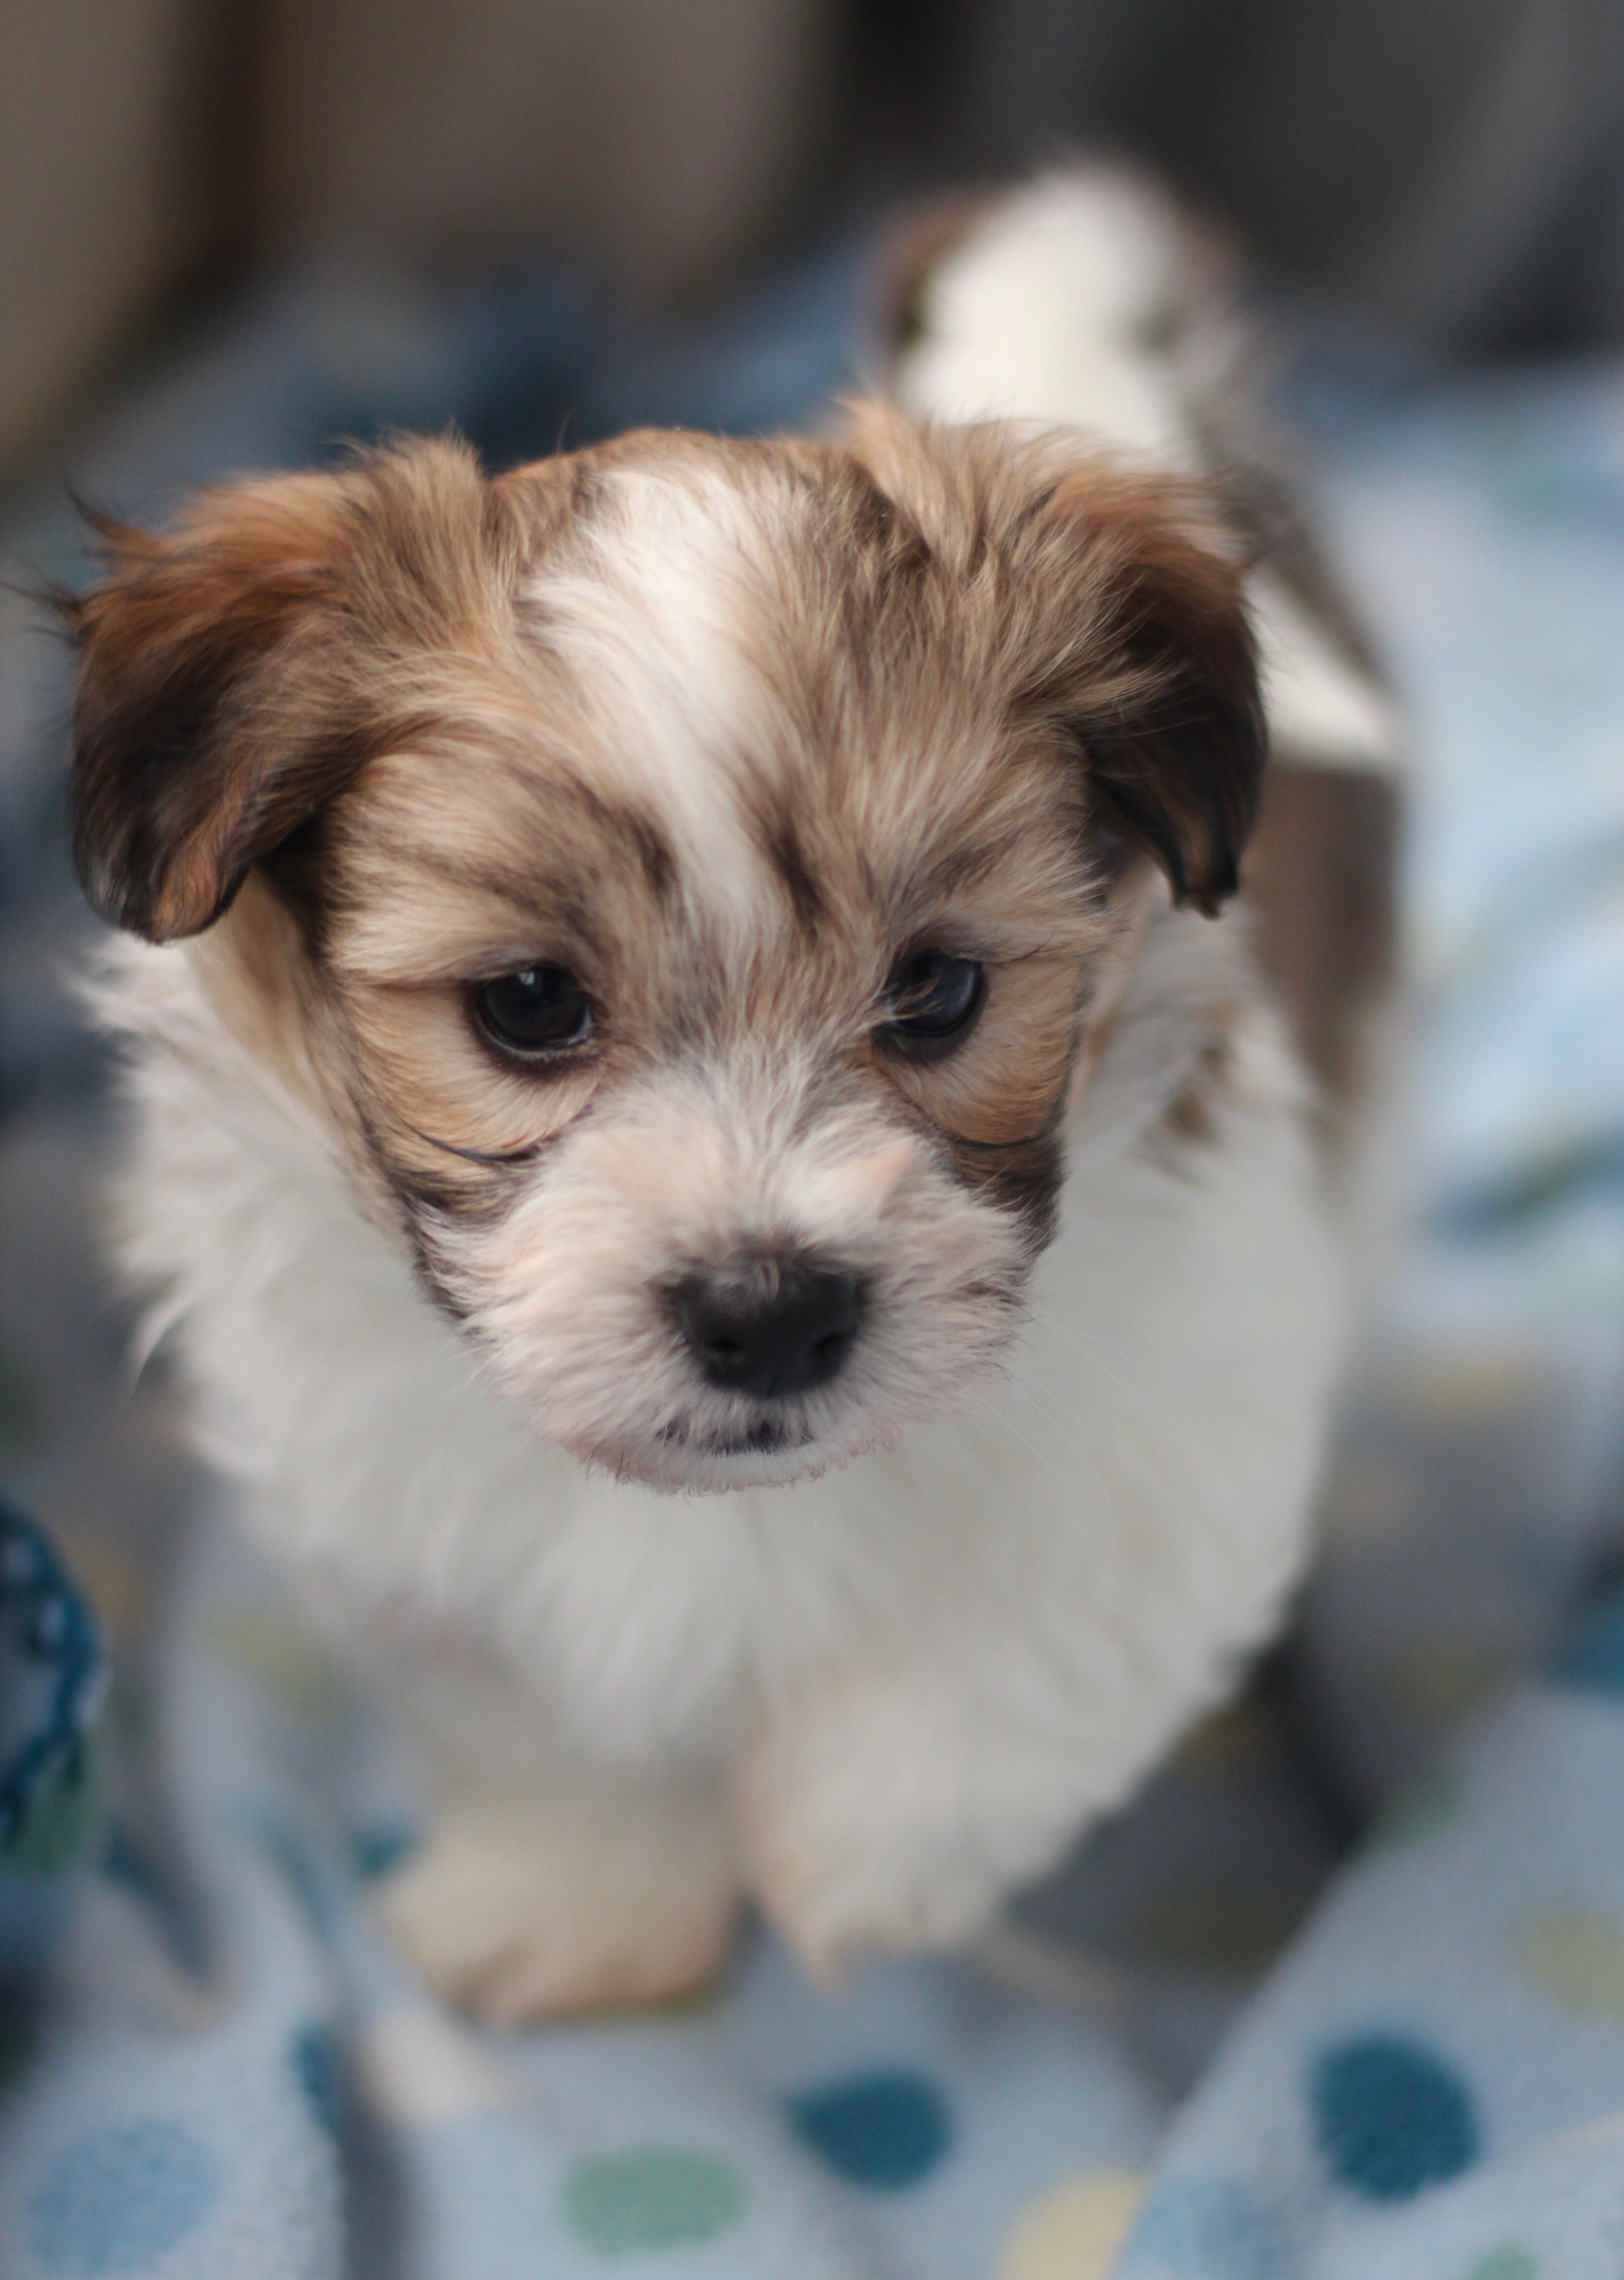 Our sweet Bichon Shih Tzu puppies! Shichon, Zuchon